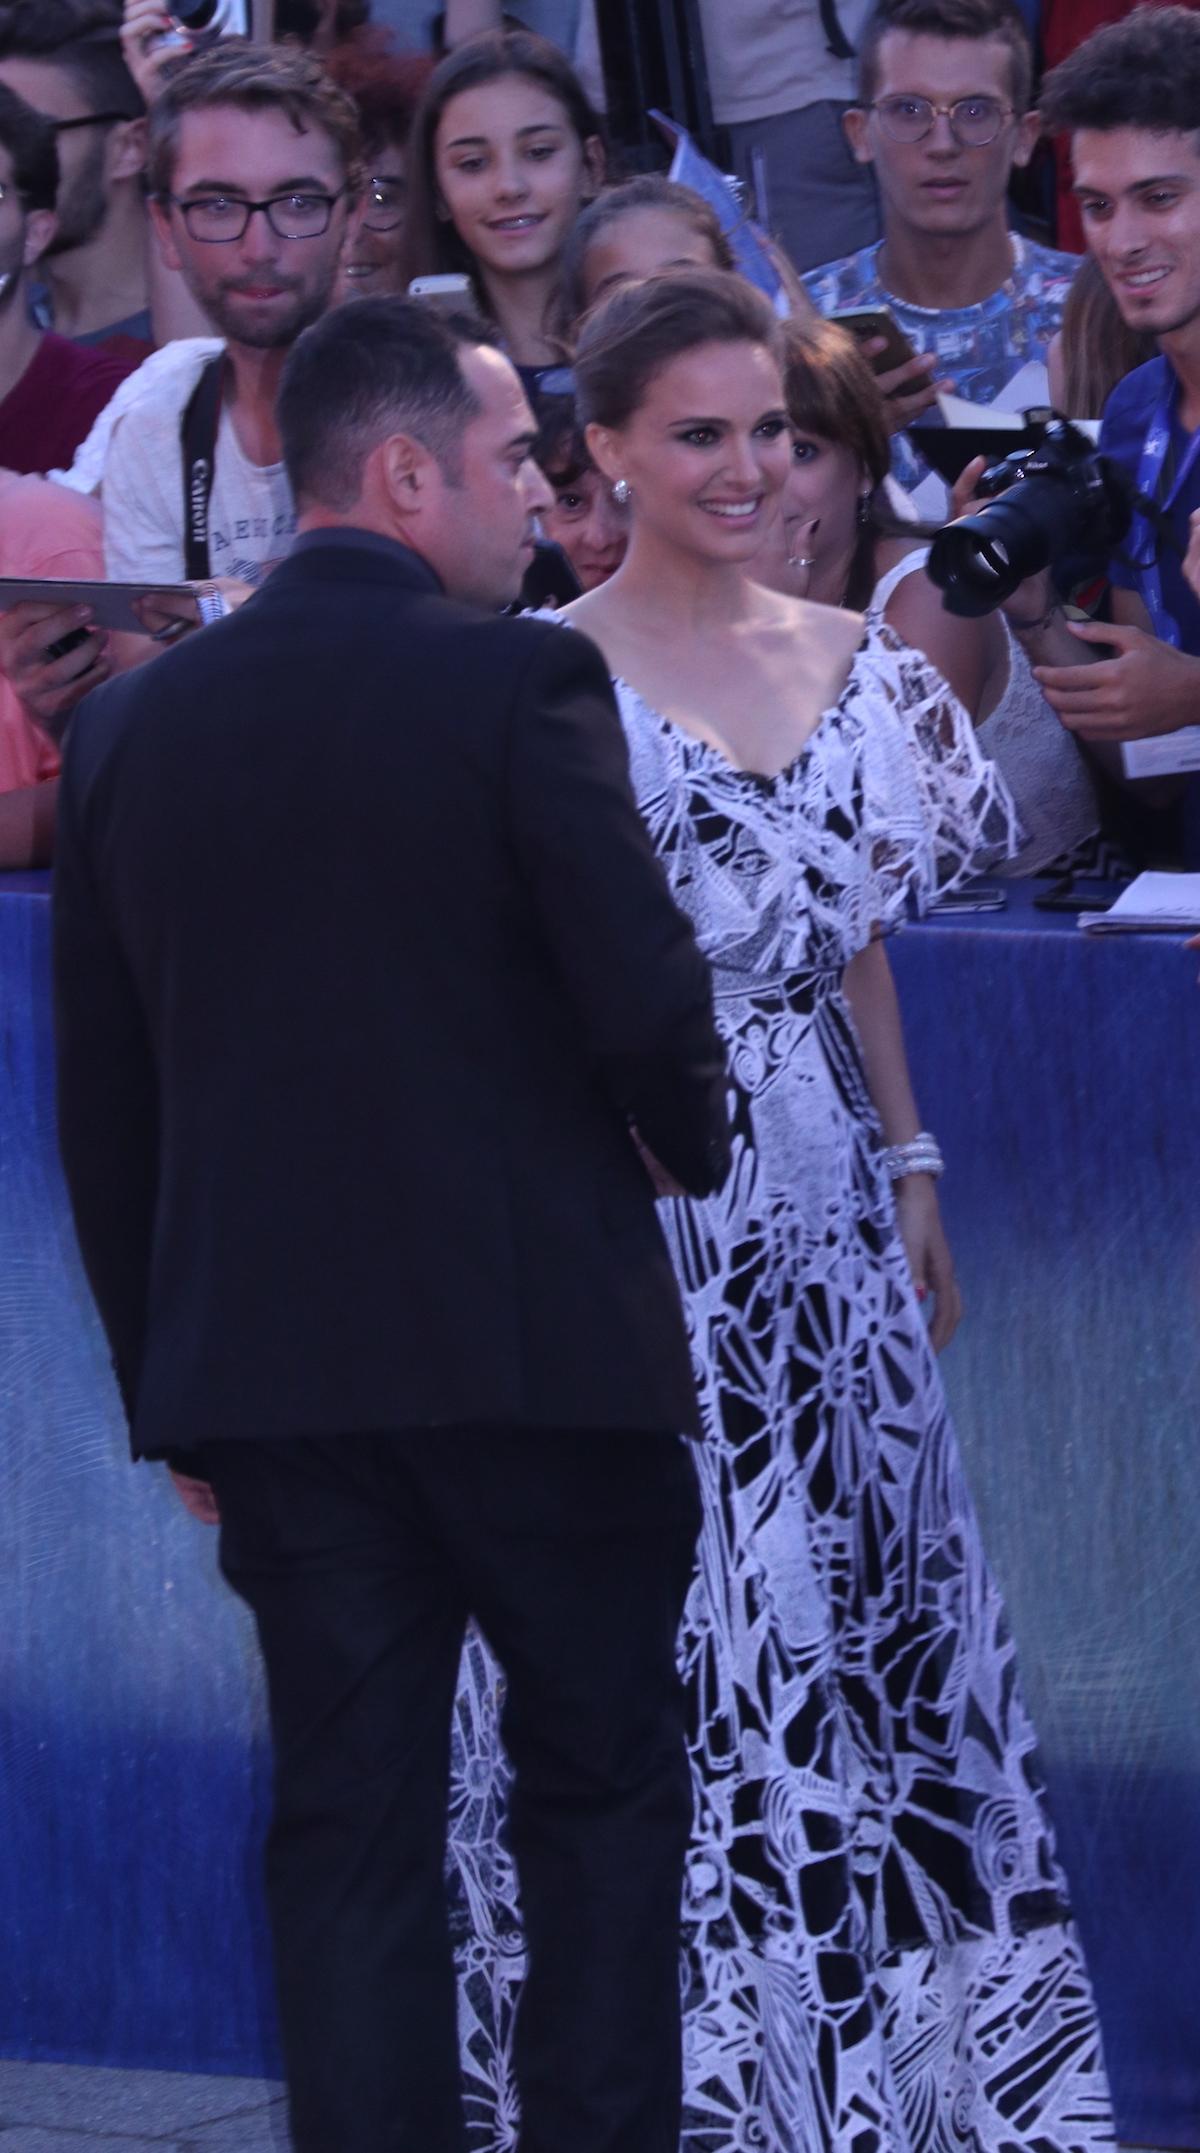 Venezia 2016: Natalie Portman vicino ai fan sul red carpet di Jackie